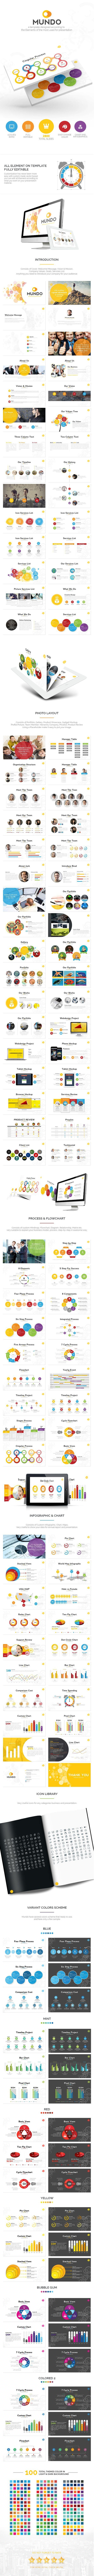 Mundo powerpoint conquered your presentations business mundo powerpoint conquered your presentations toneelgroepblik Images